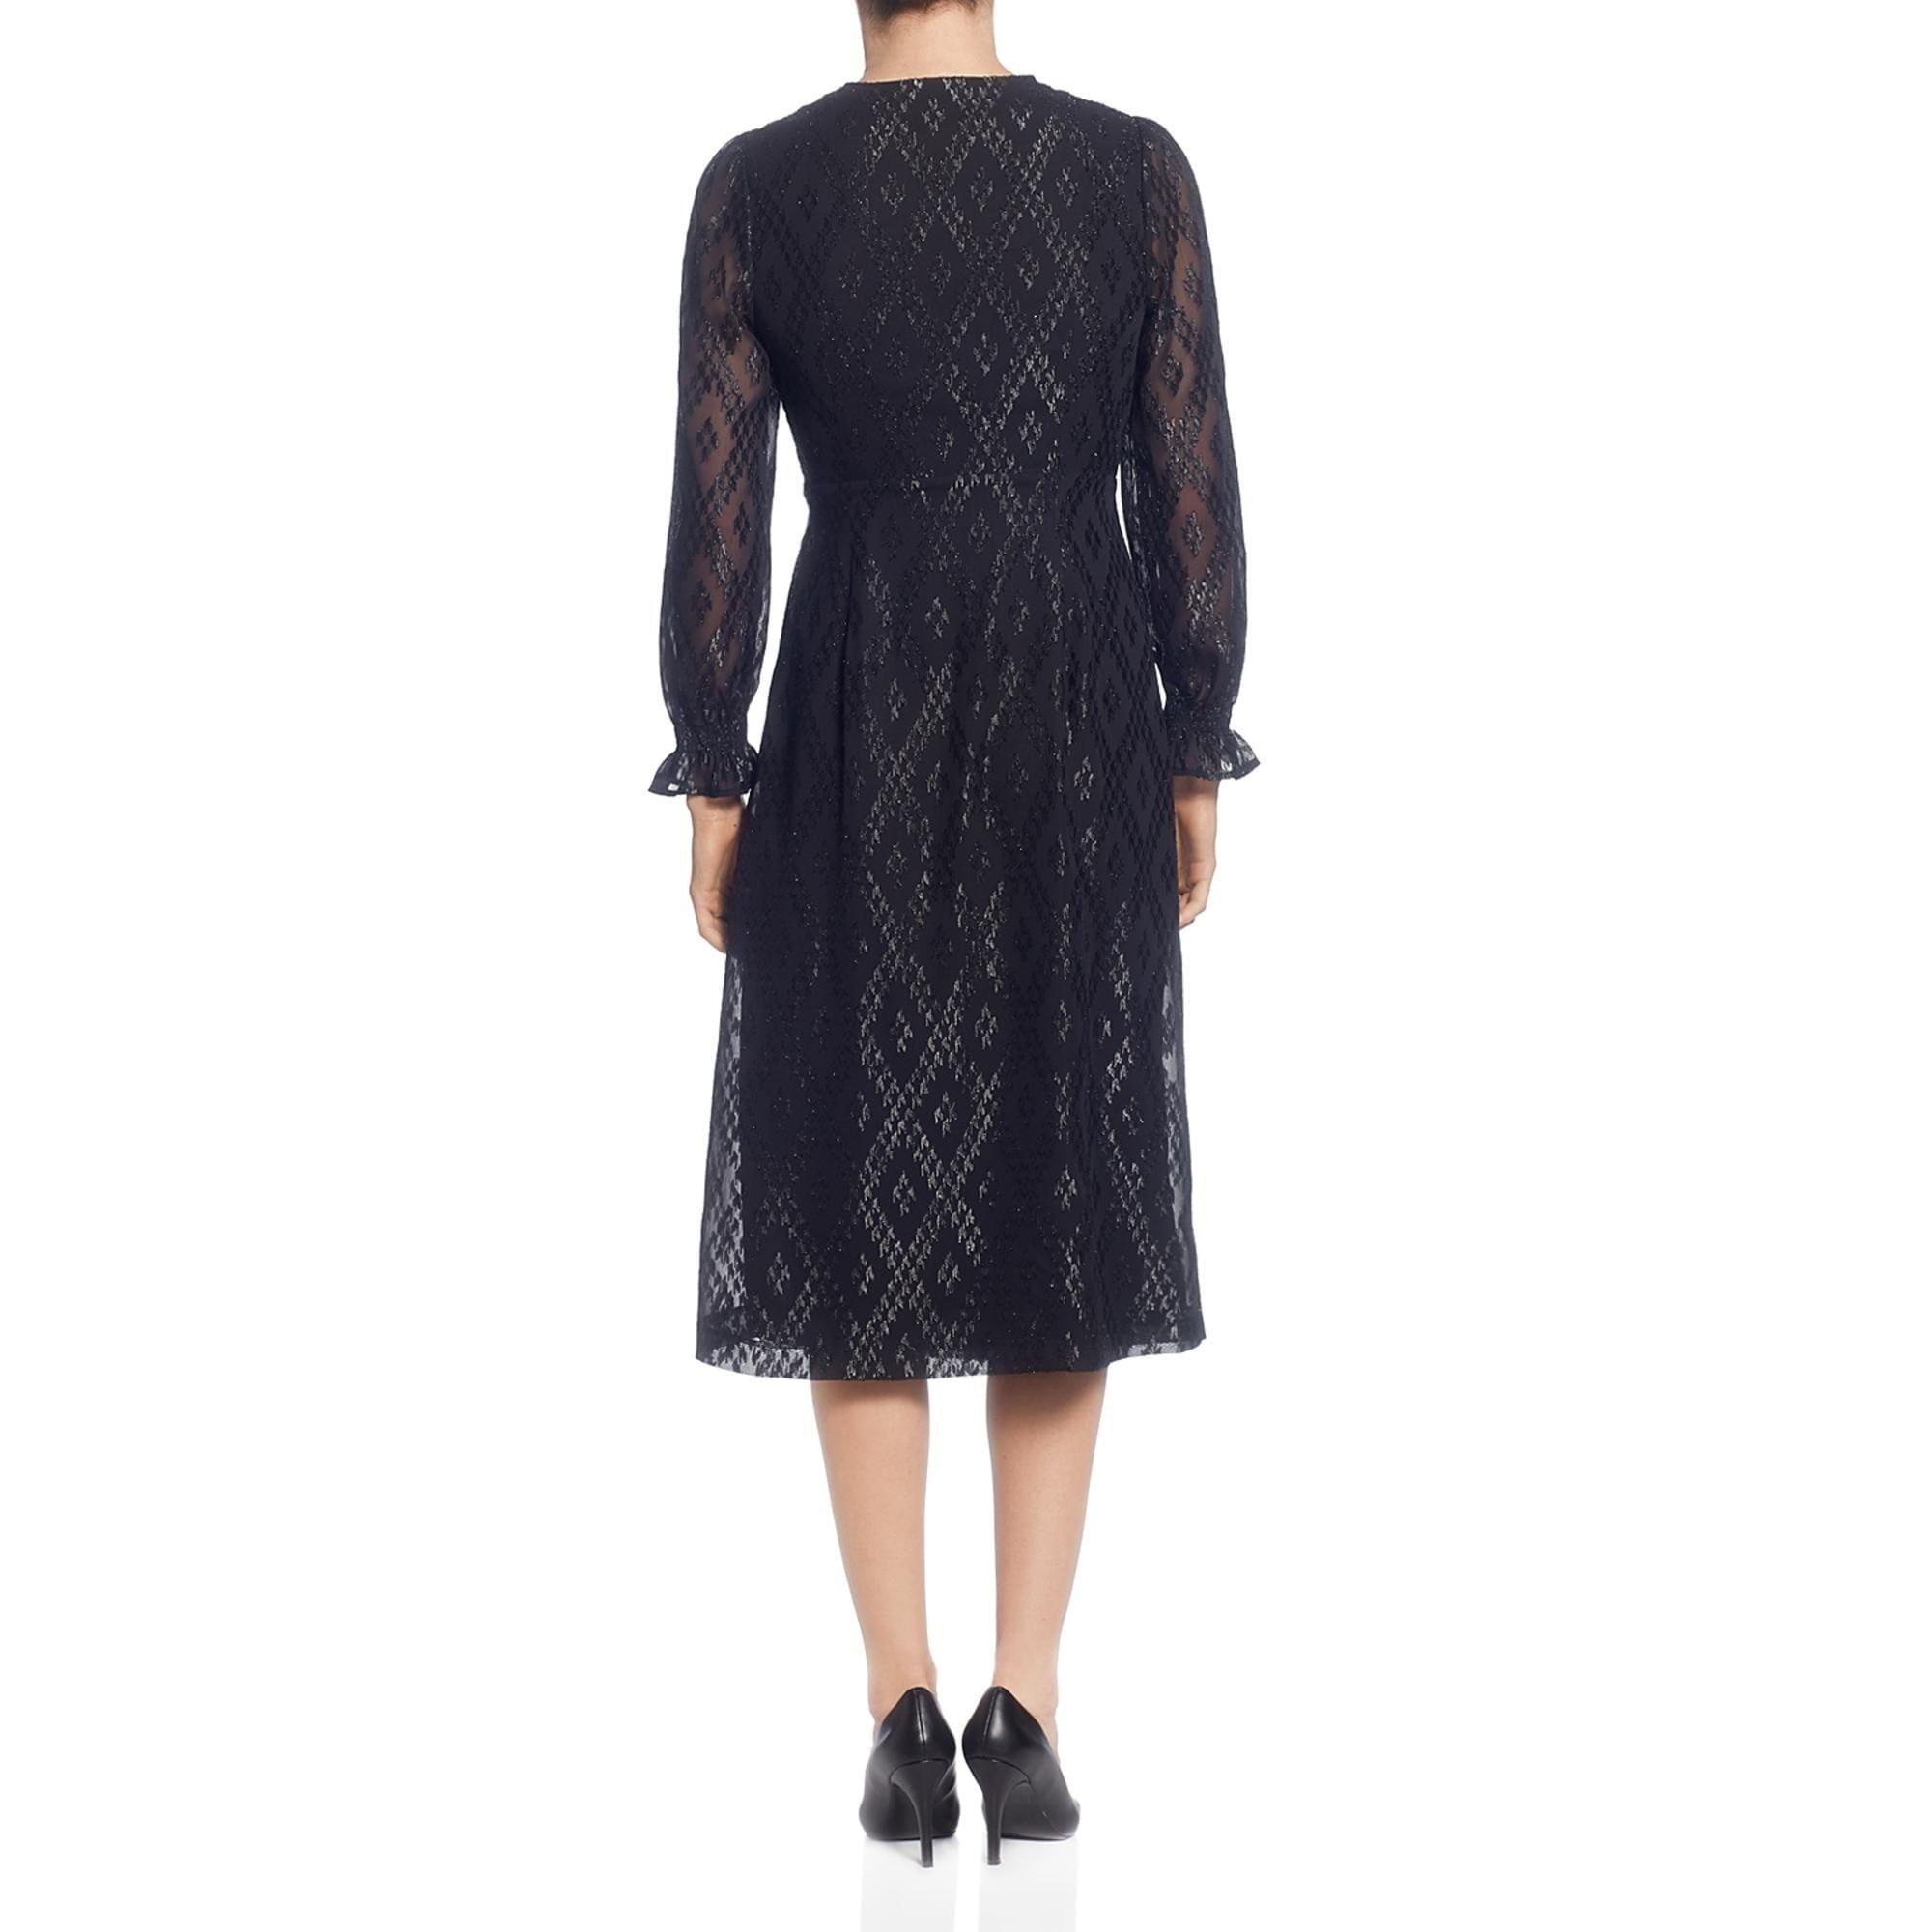 T Tahari Womens Dotted Cap Sleeves Faux Wrap Dress BHFO 9015